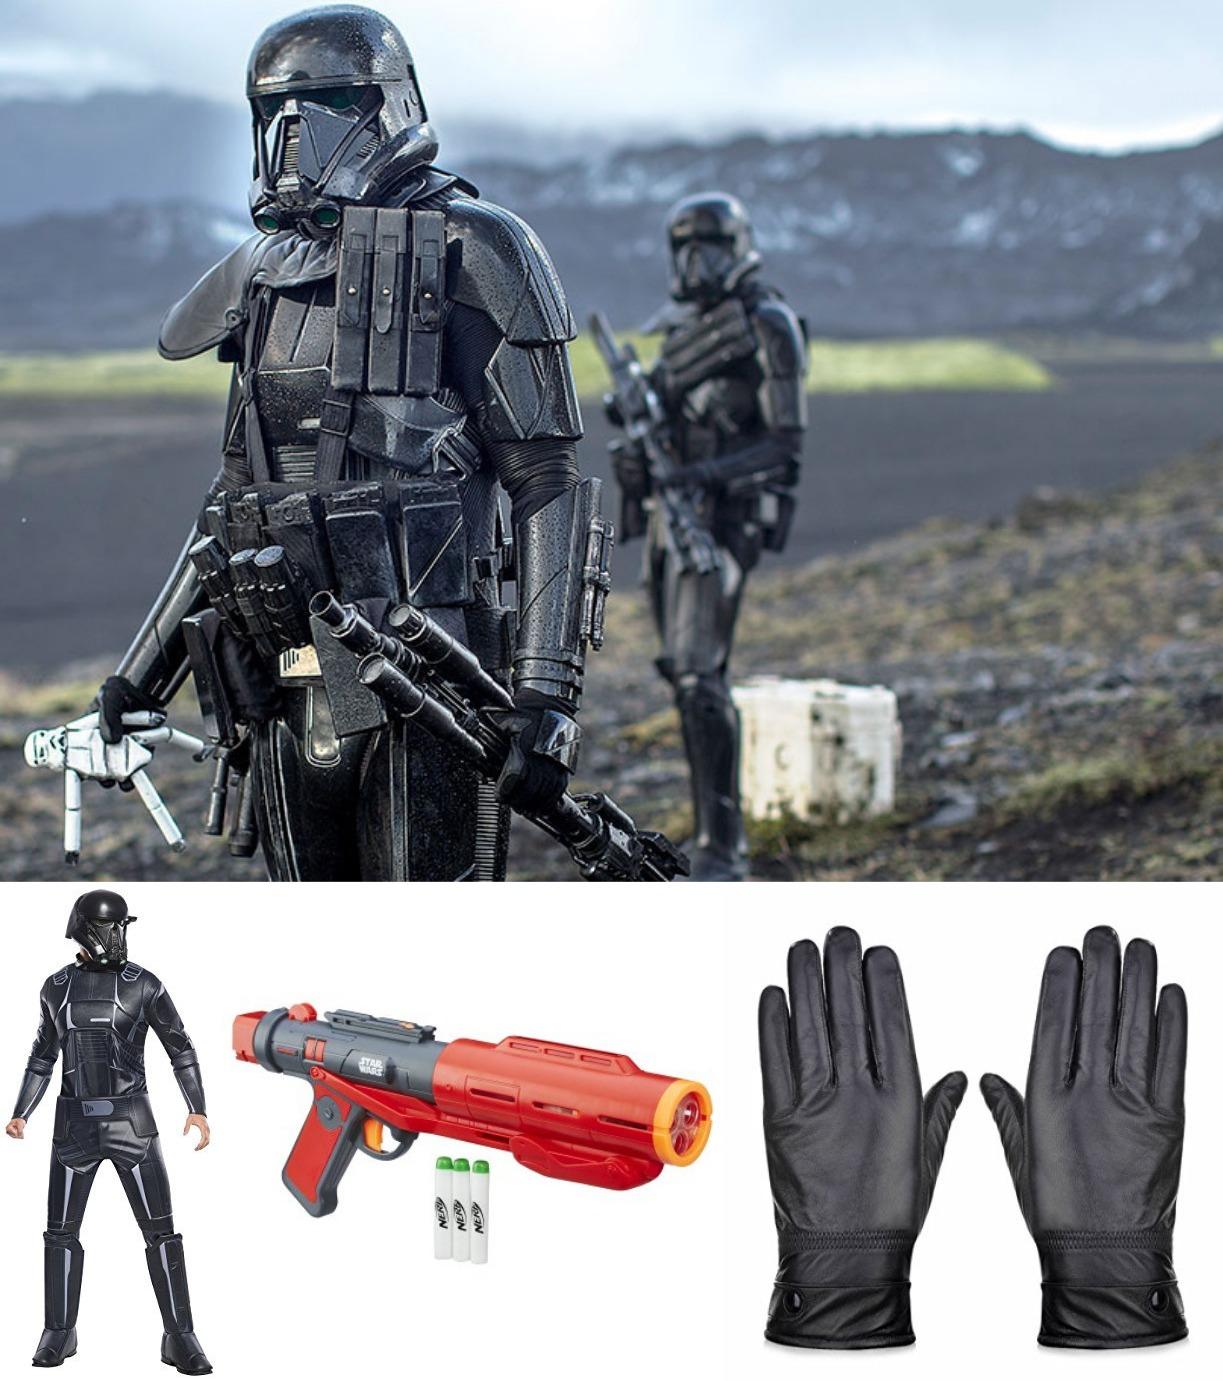 Star Wars Costumes | Cosplay DIY Ideas